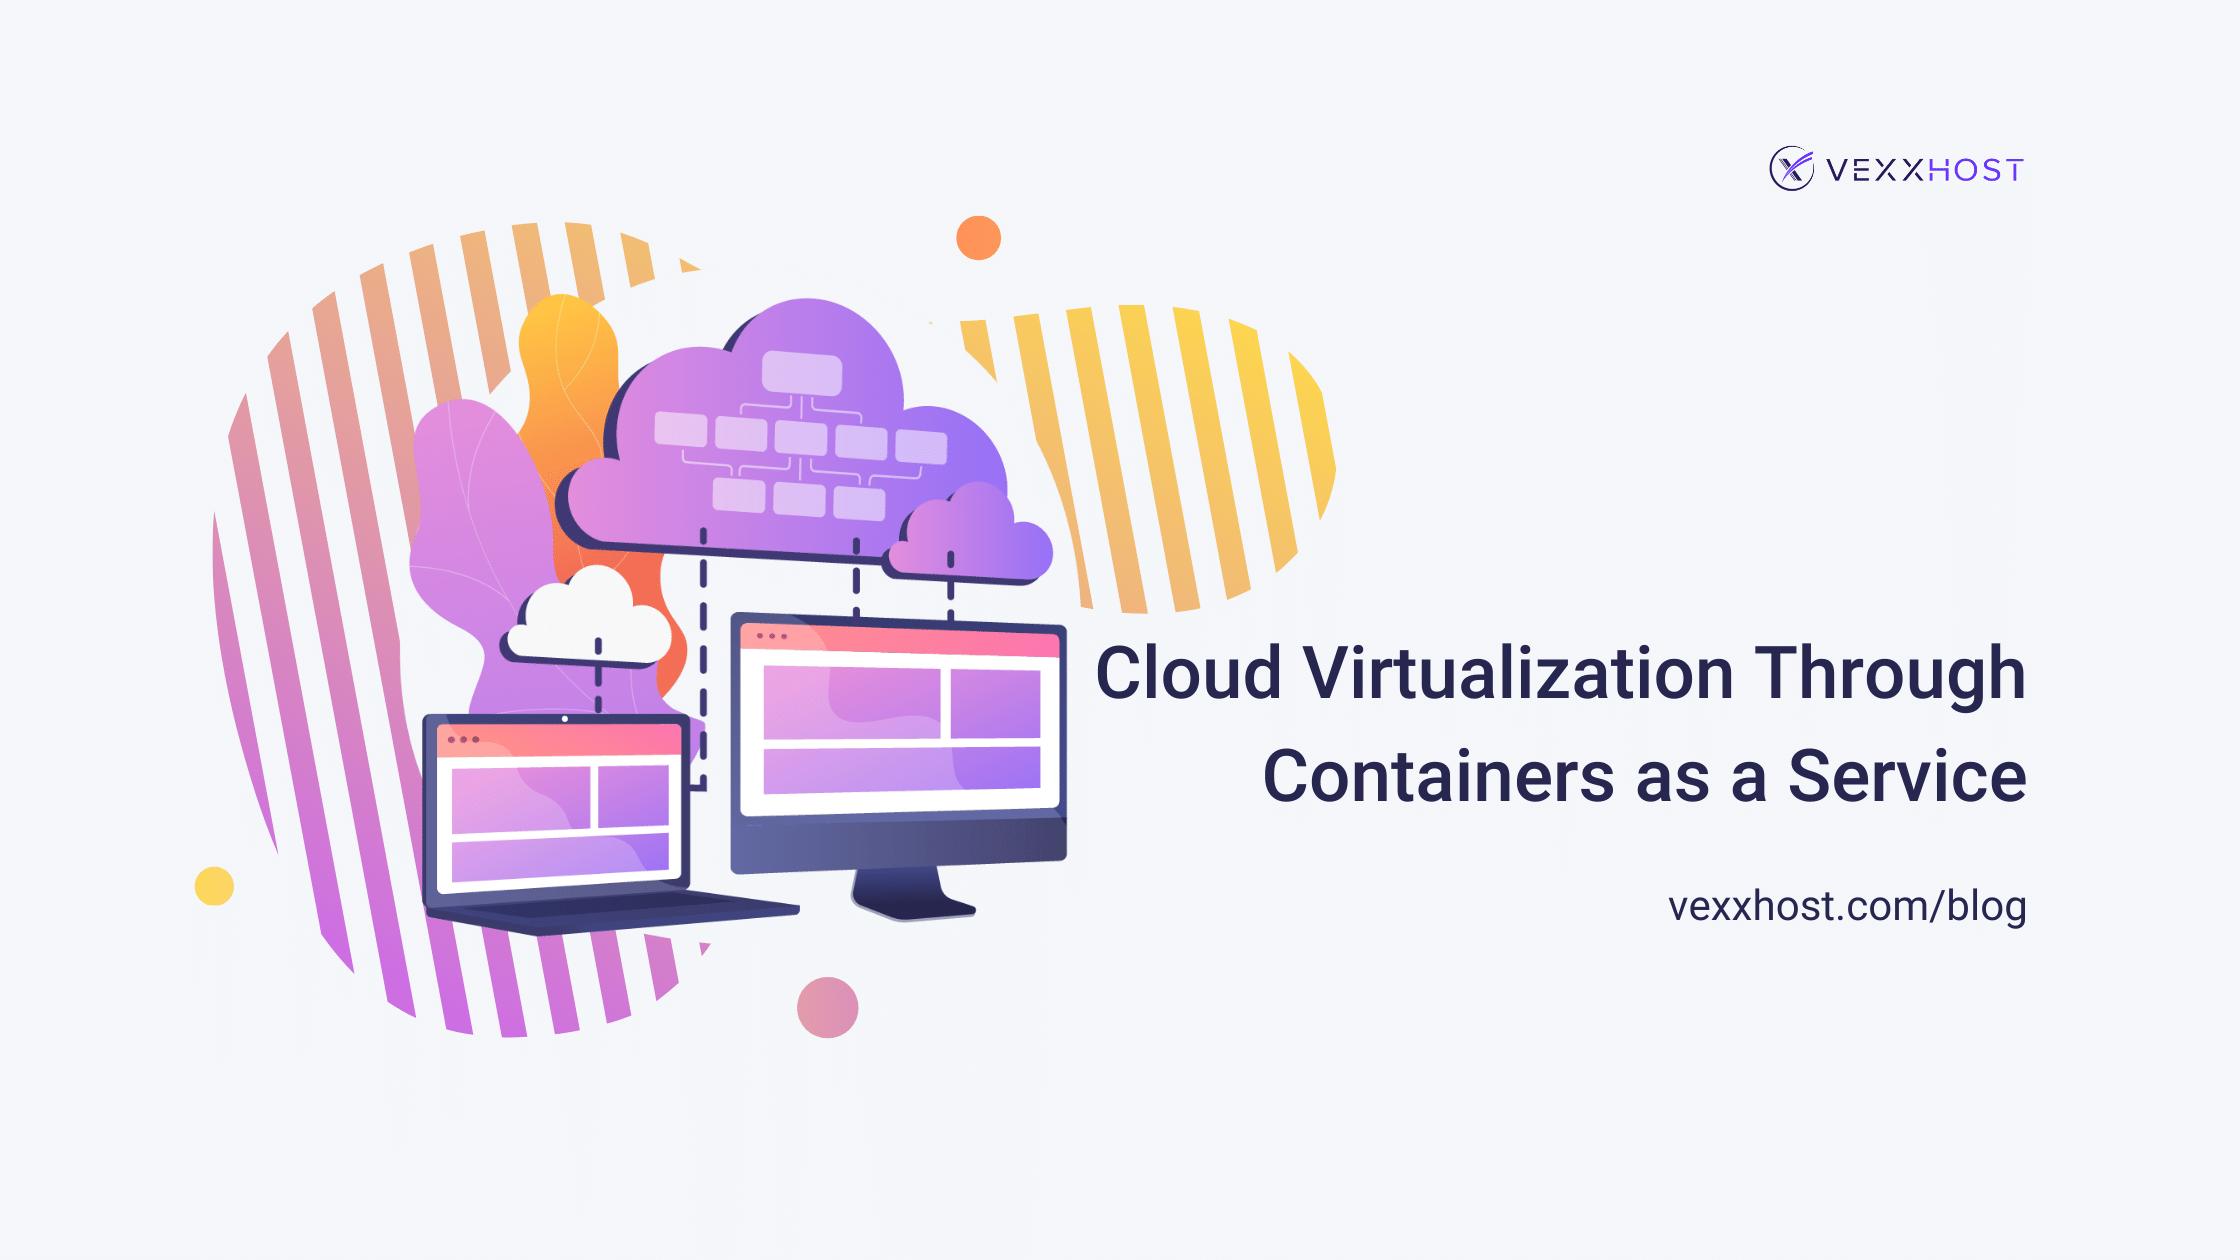 Cloud-Virtualization-through-Containers-as-a-Service-CaaS-blog-header-vexxhost